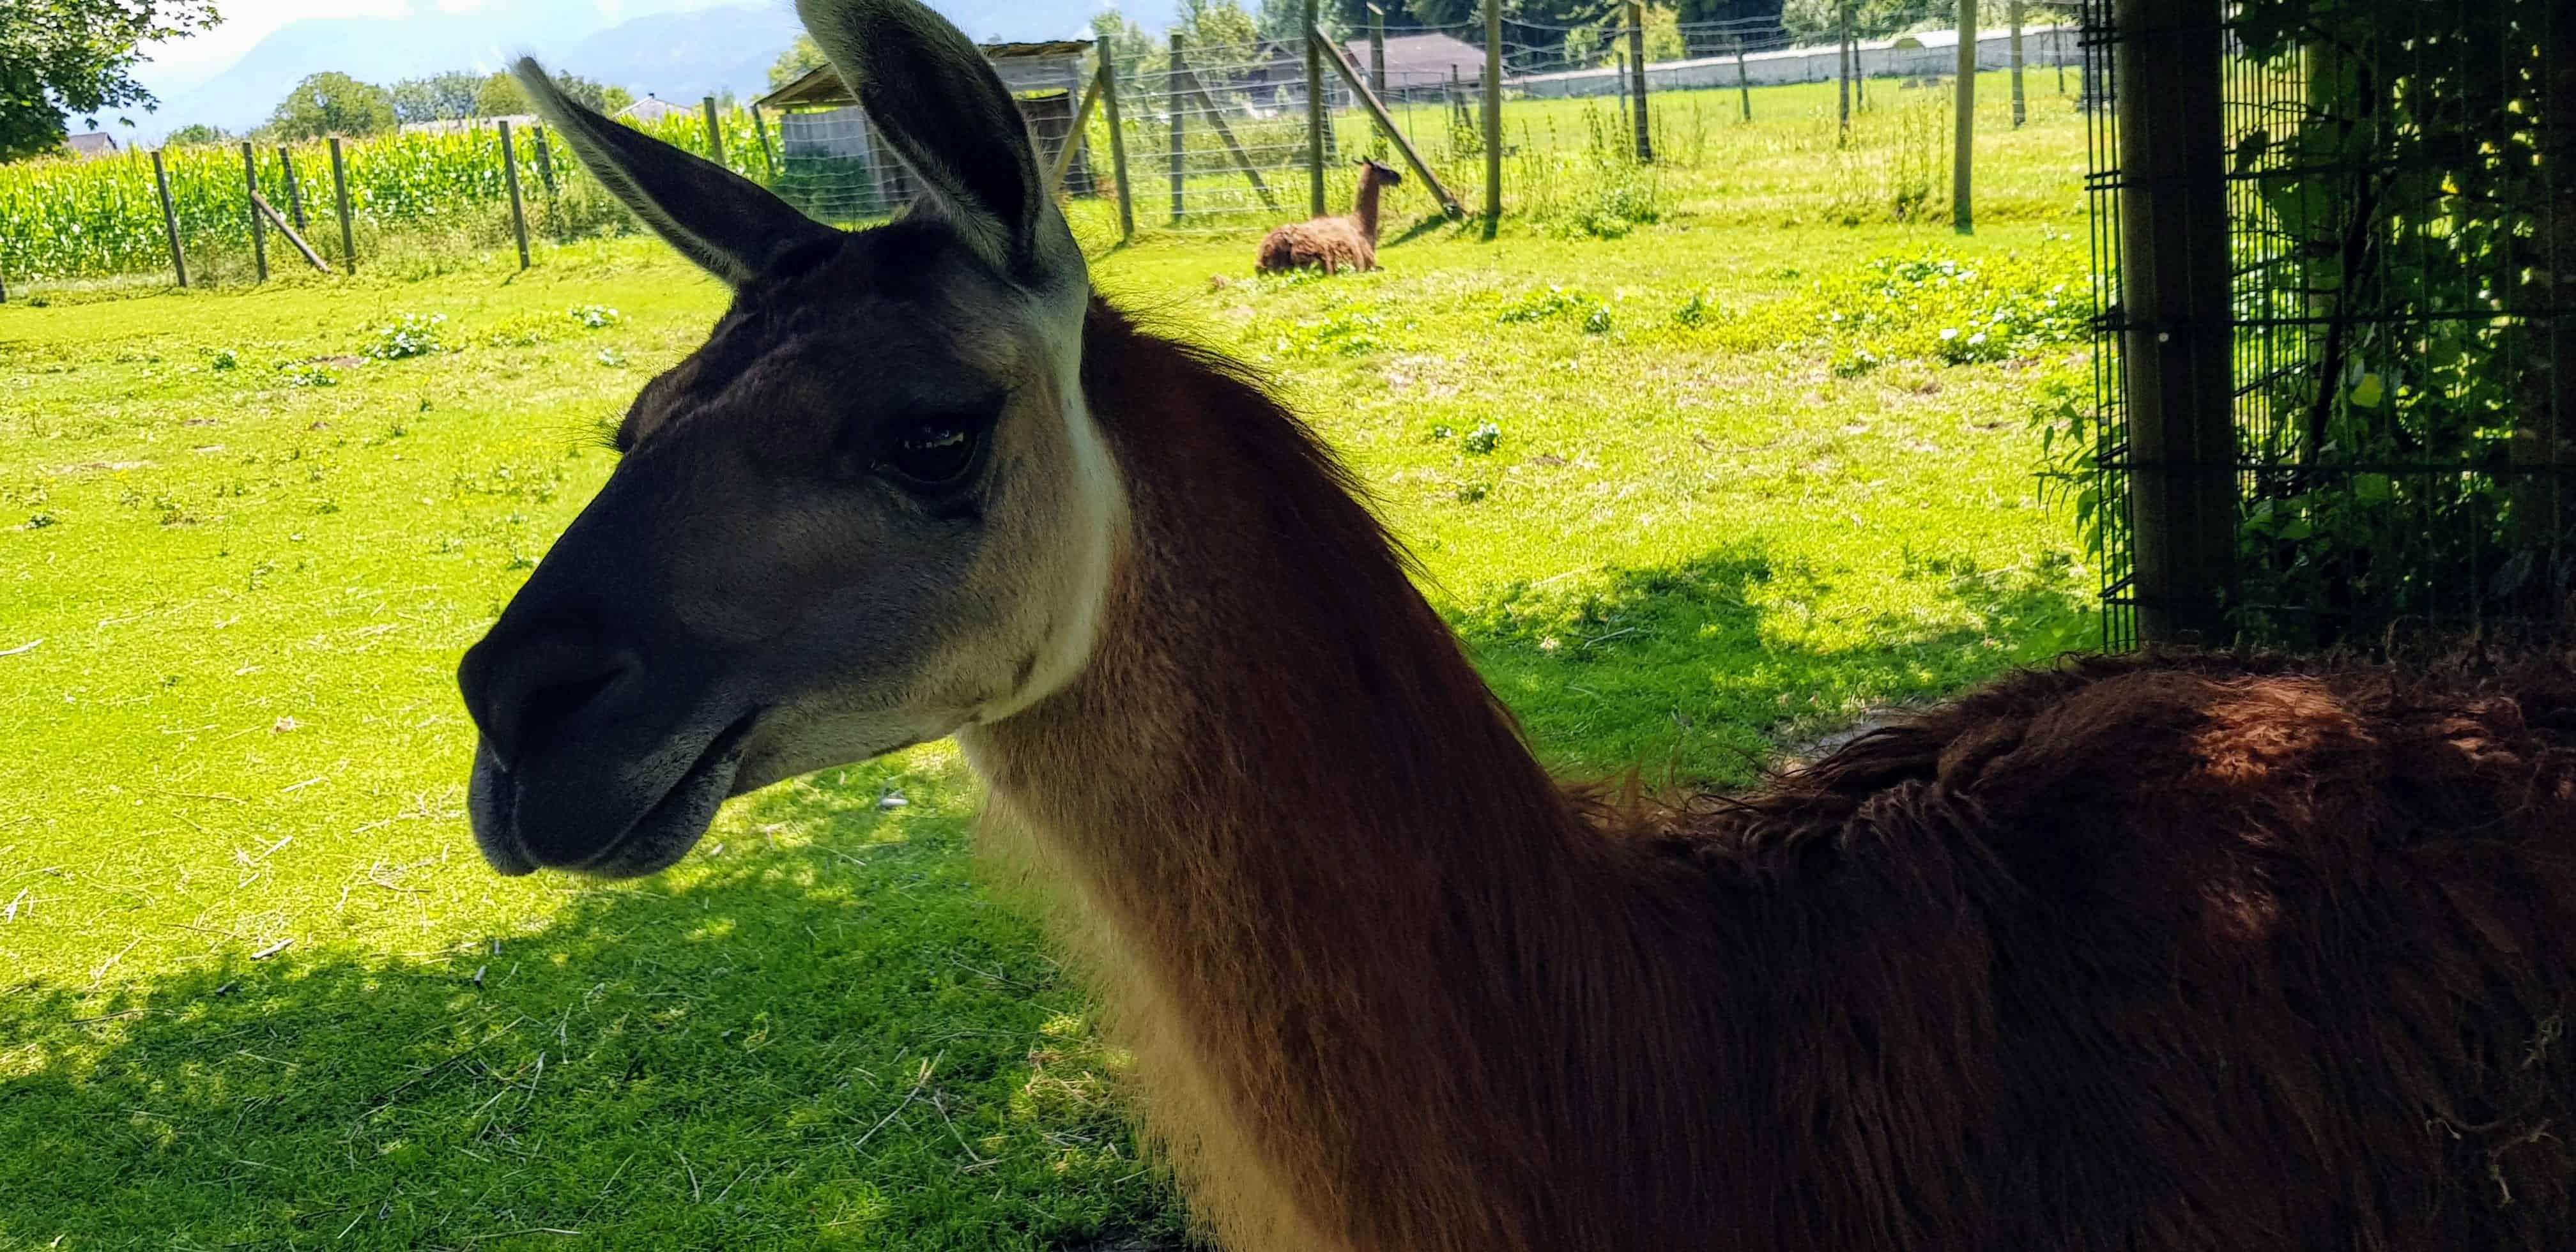 Familienausflug Streichelzoo Tierpark Schloss Labyrinth Rosegg Kärnten Lama